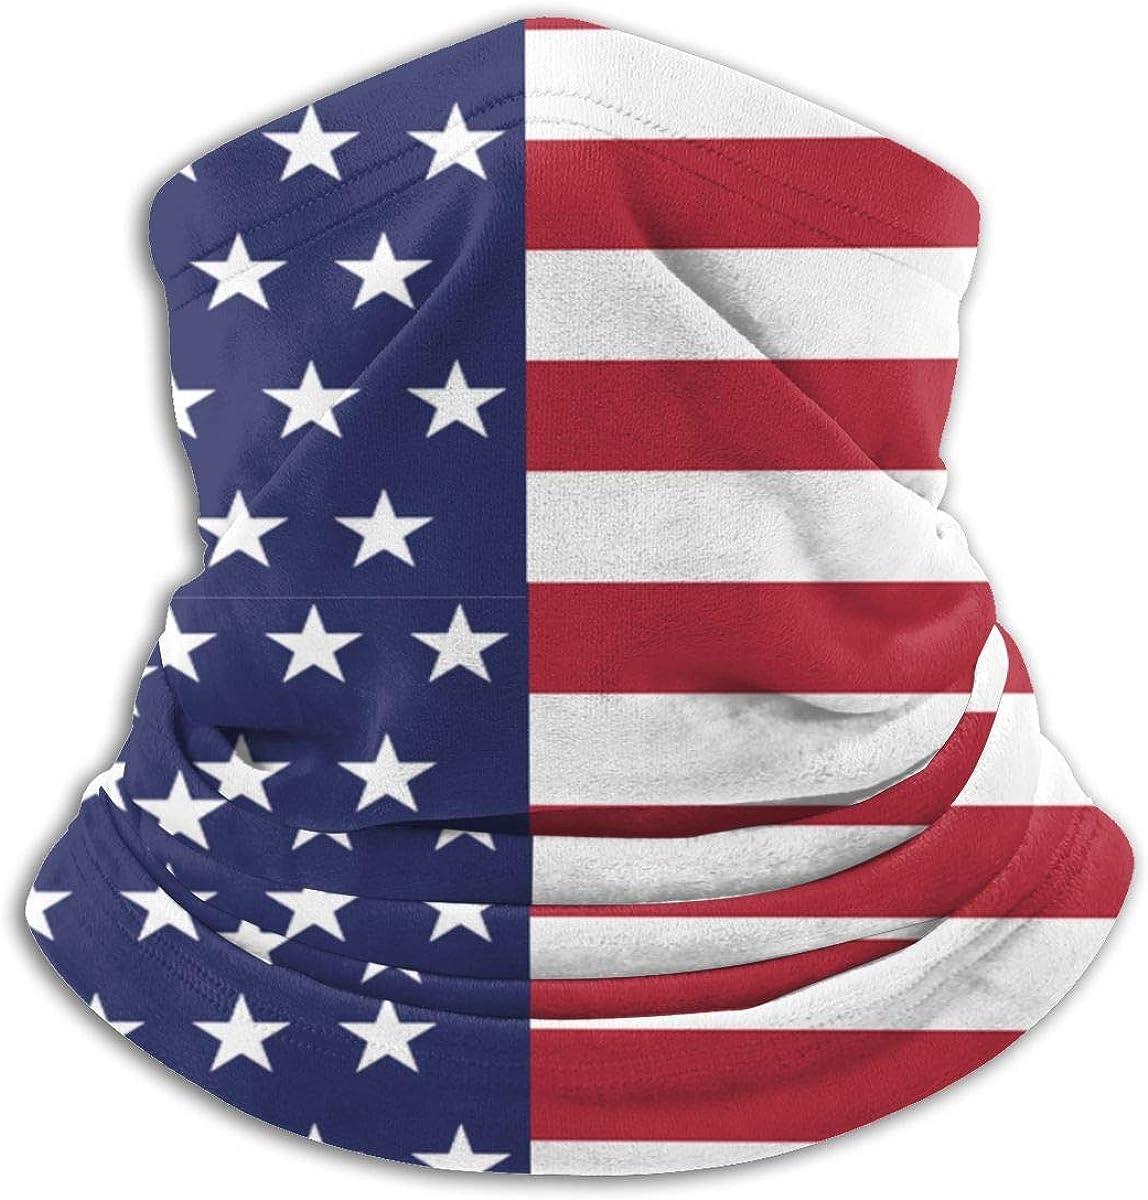 Kimisoy USA American Flag Neck Gaiter Windproof Face Cover Versatility Neck Warmer Dust-Proof Half Face Shields Soft Headwear Comfort Balaclava for Men Women Kids Black